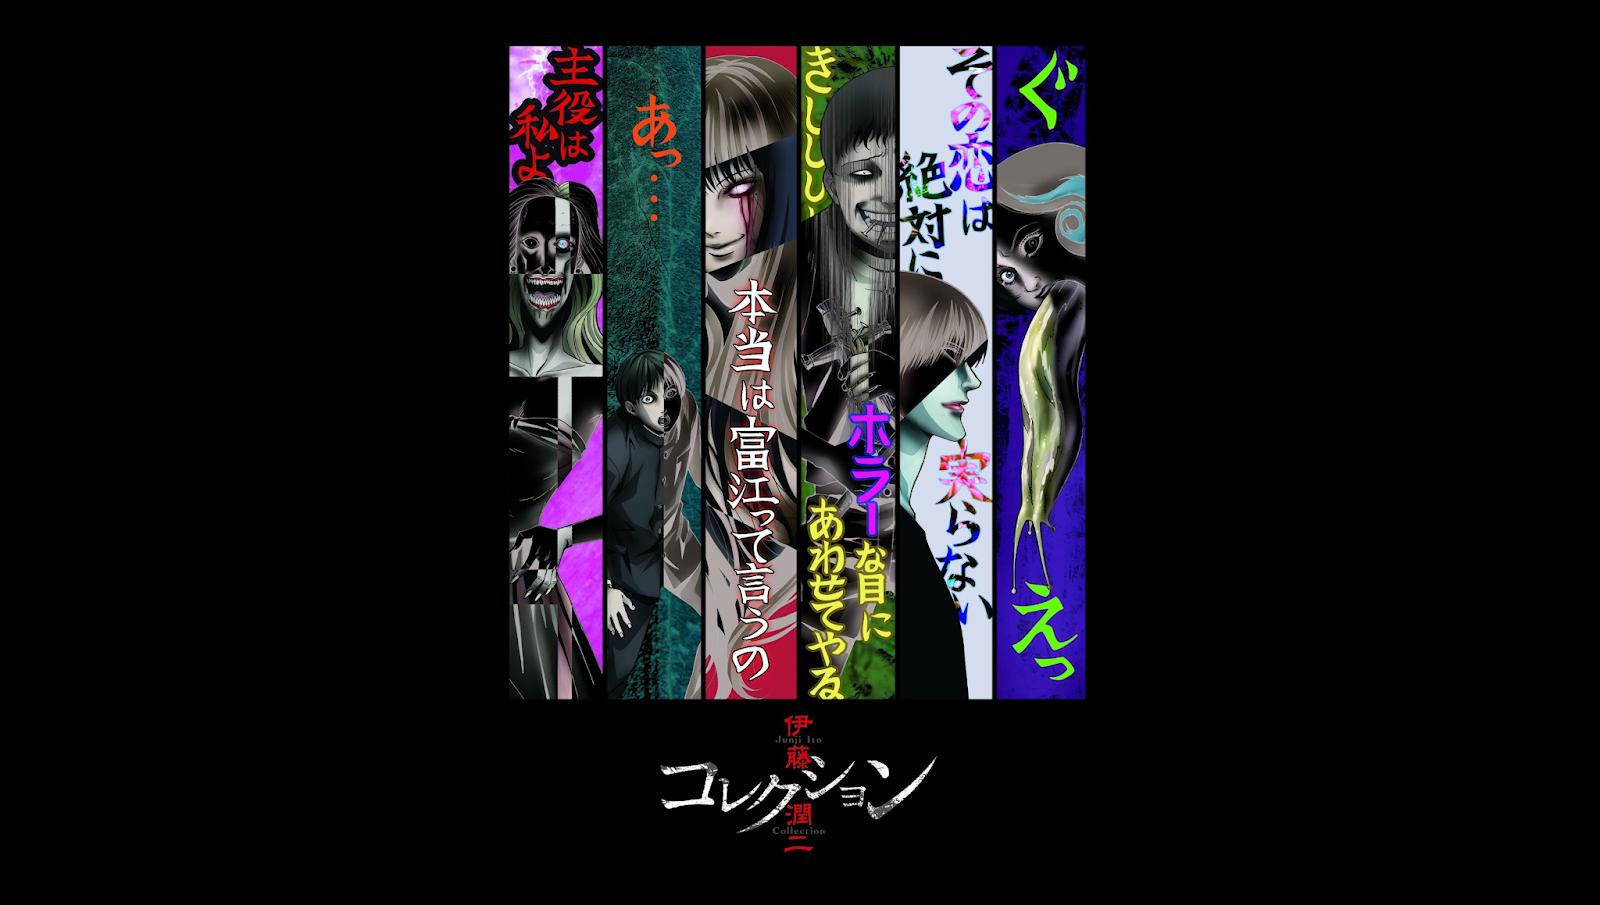 Junji Ito: Collection (Anime kritika)